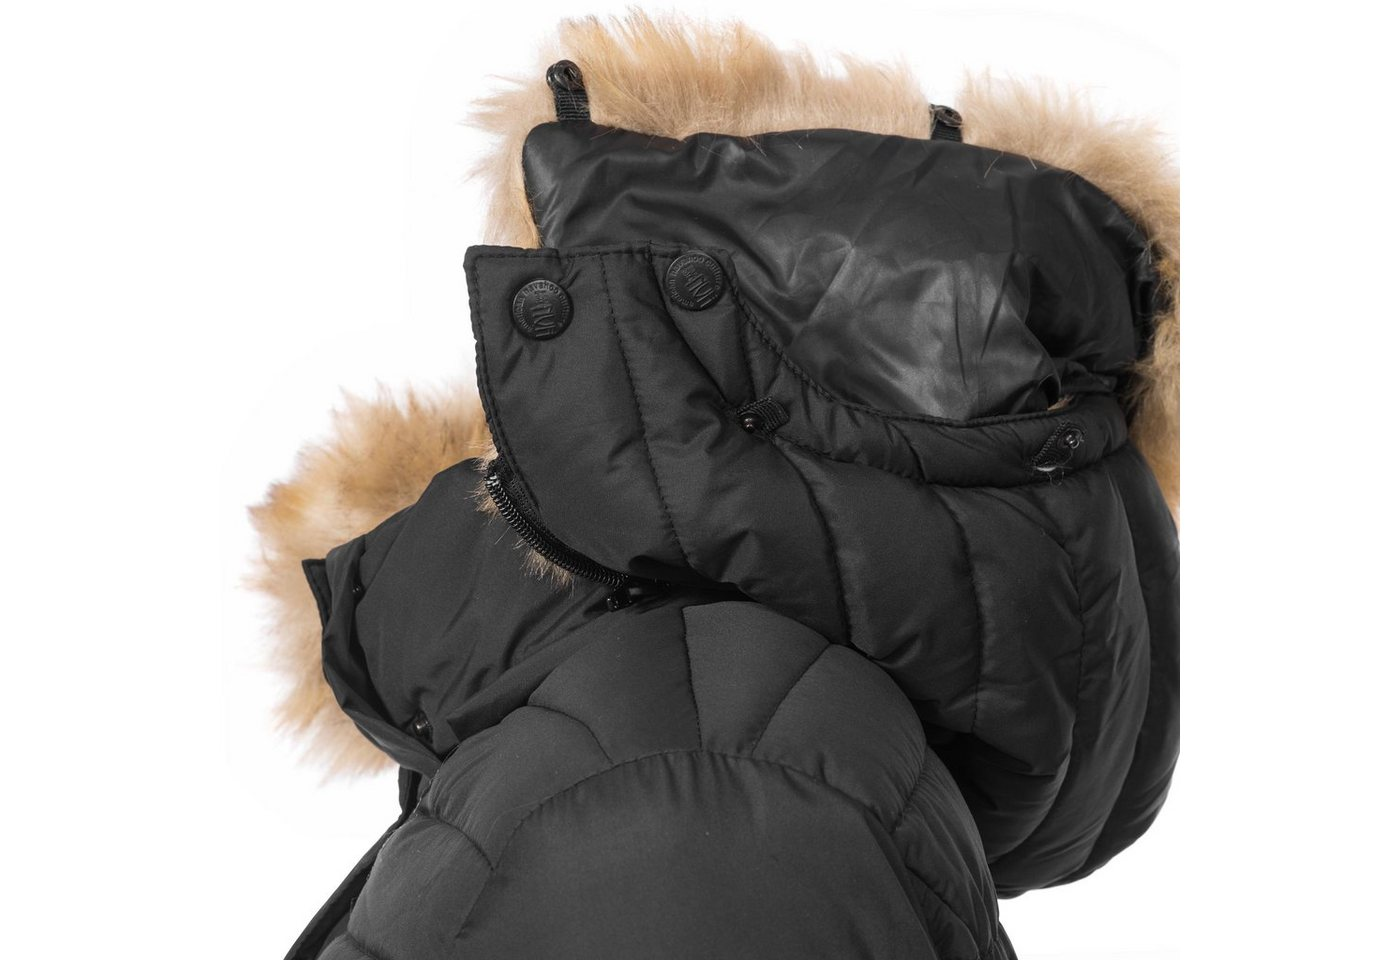 Damen Navahoo Steppmantel Täubchen, hochwertiger Winterparka m. Kunstfellkapuze rot, schwarz | 04059072113442